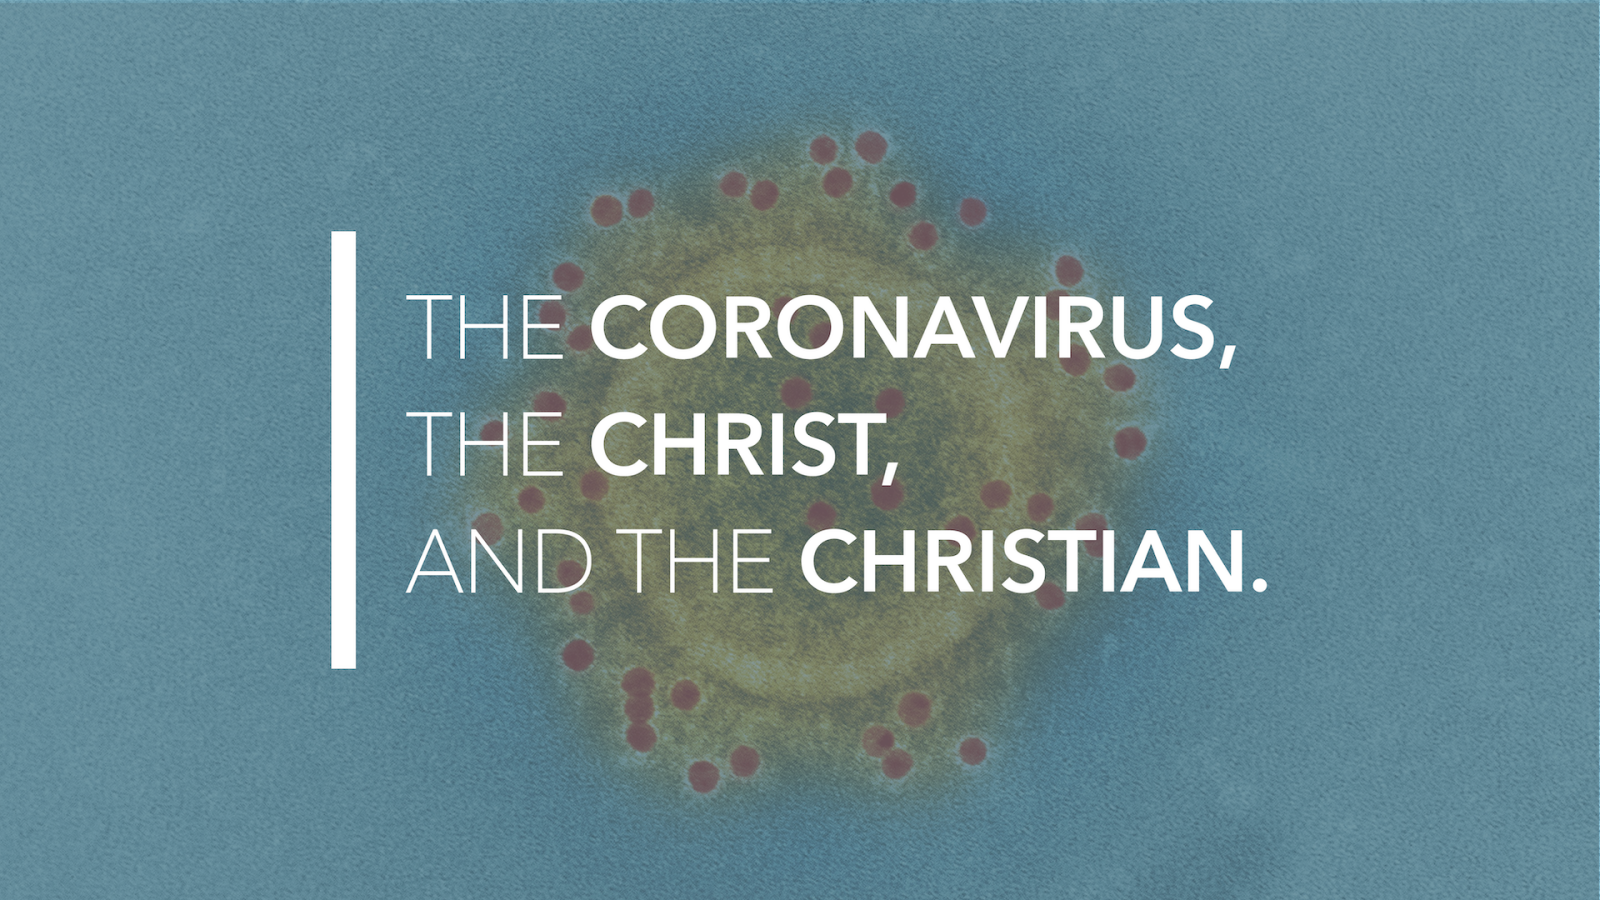 The Coronavirus, The Christ, And The Christian